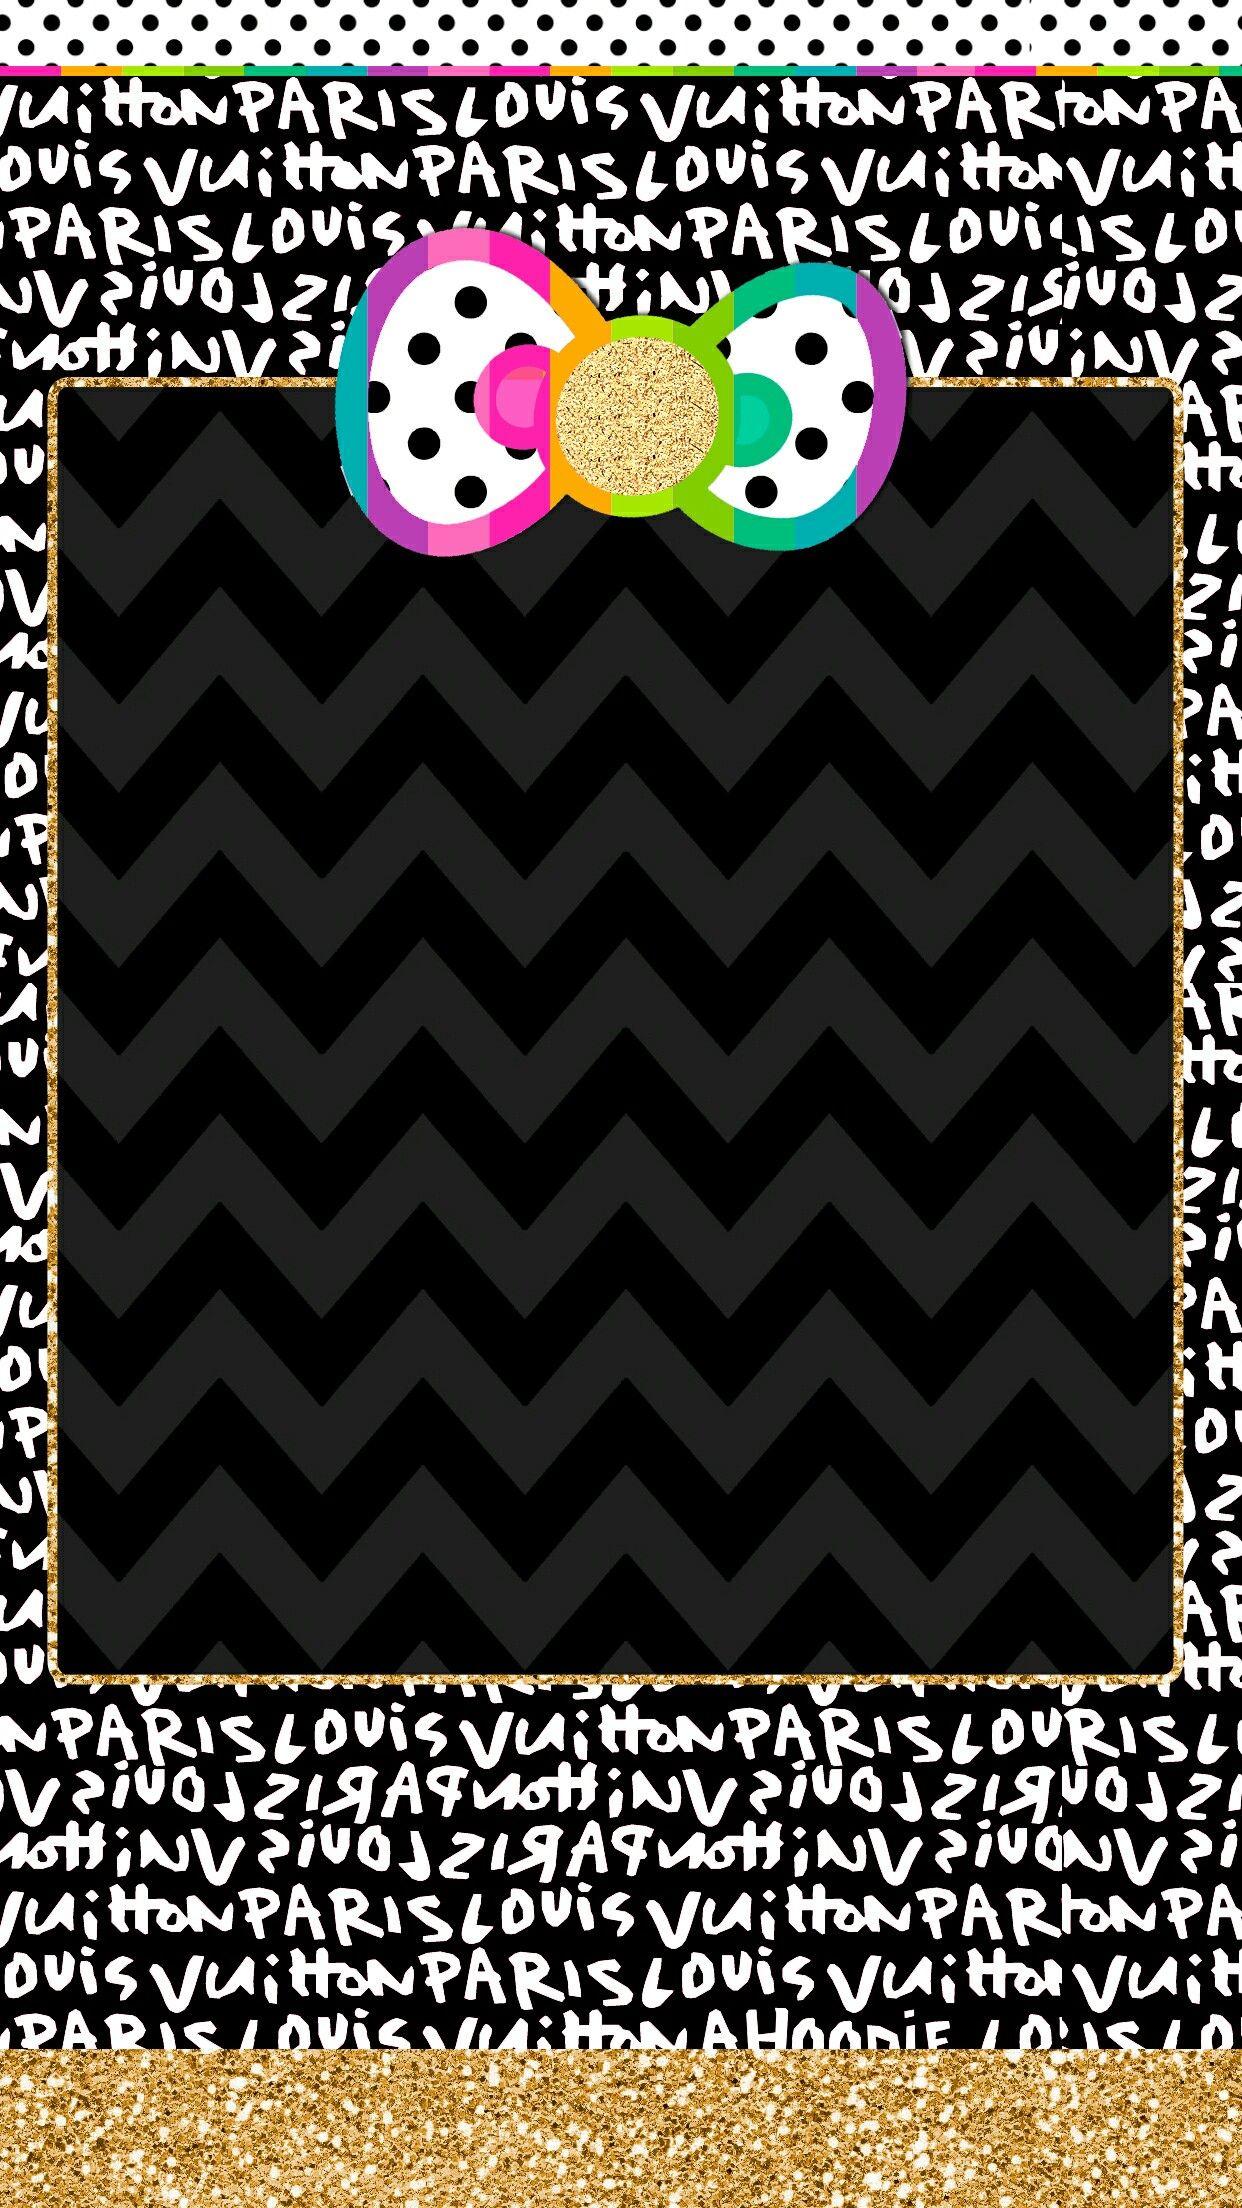 Beautiful Wallpaper Hello Kitty Ipod Touch - 581156f99b97bd955a569932ed9f3591  Pic_91981.jpg